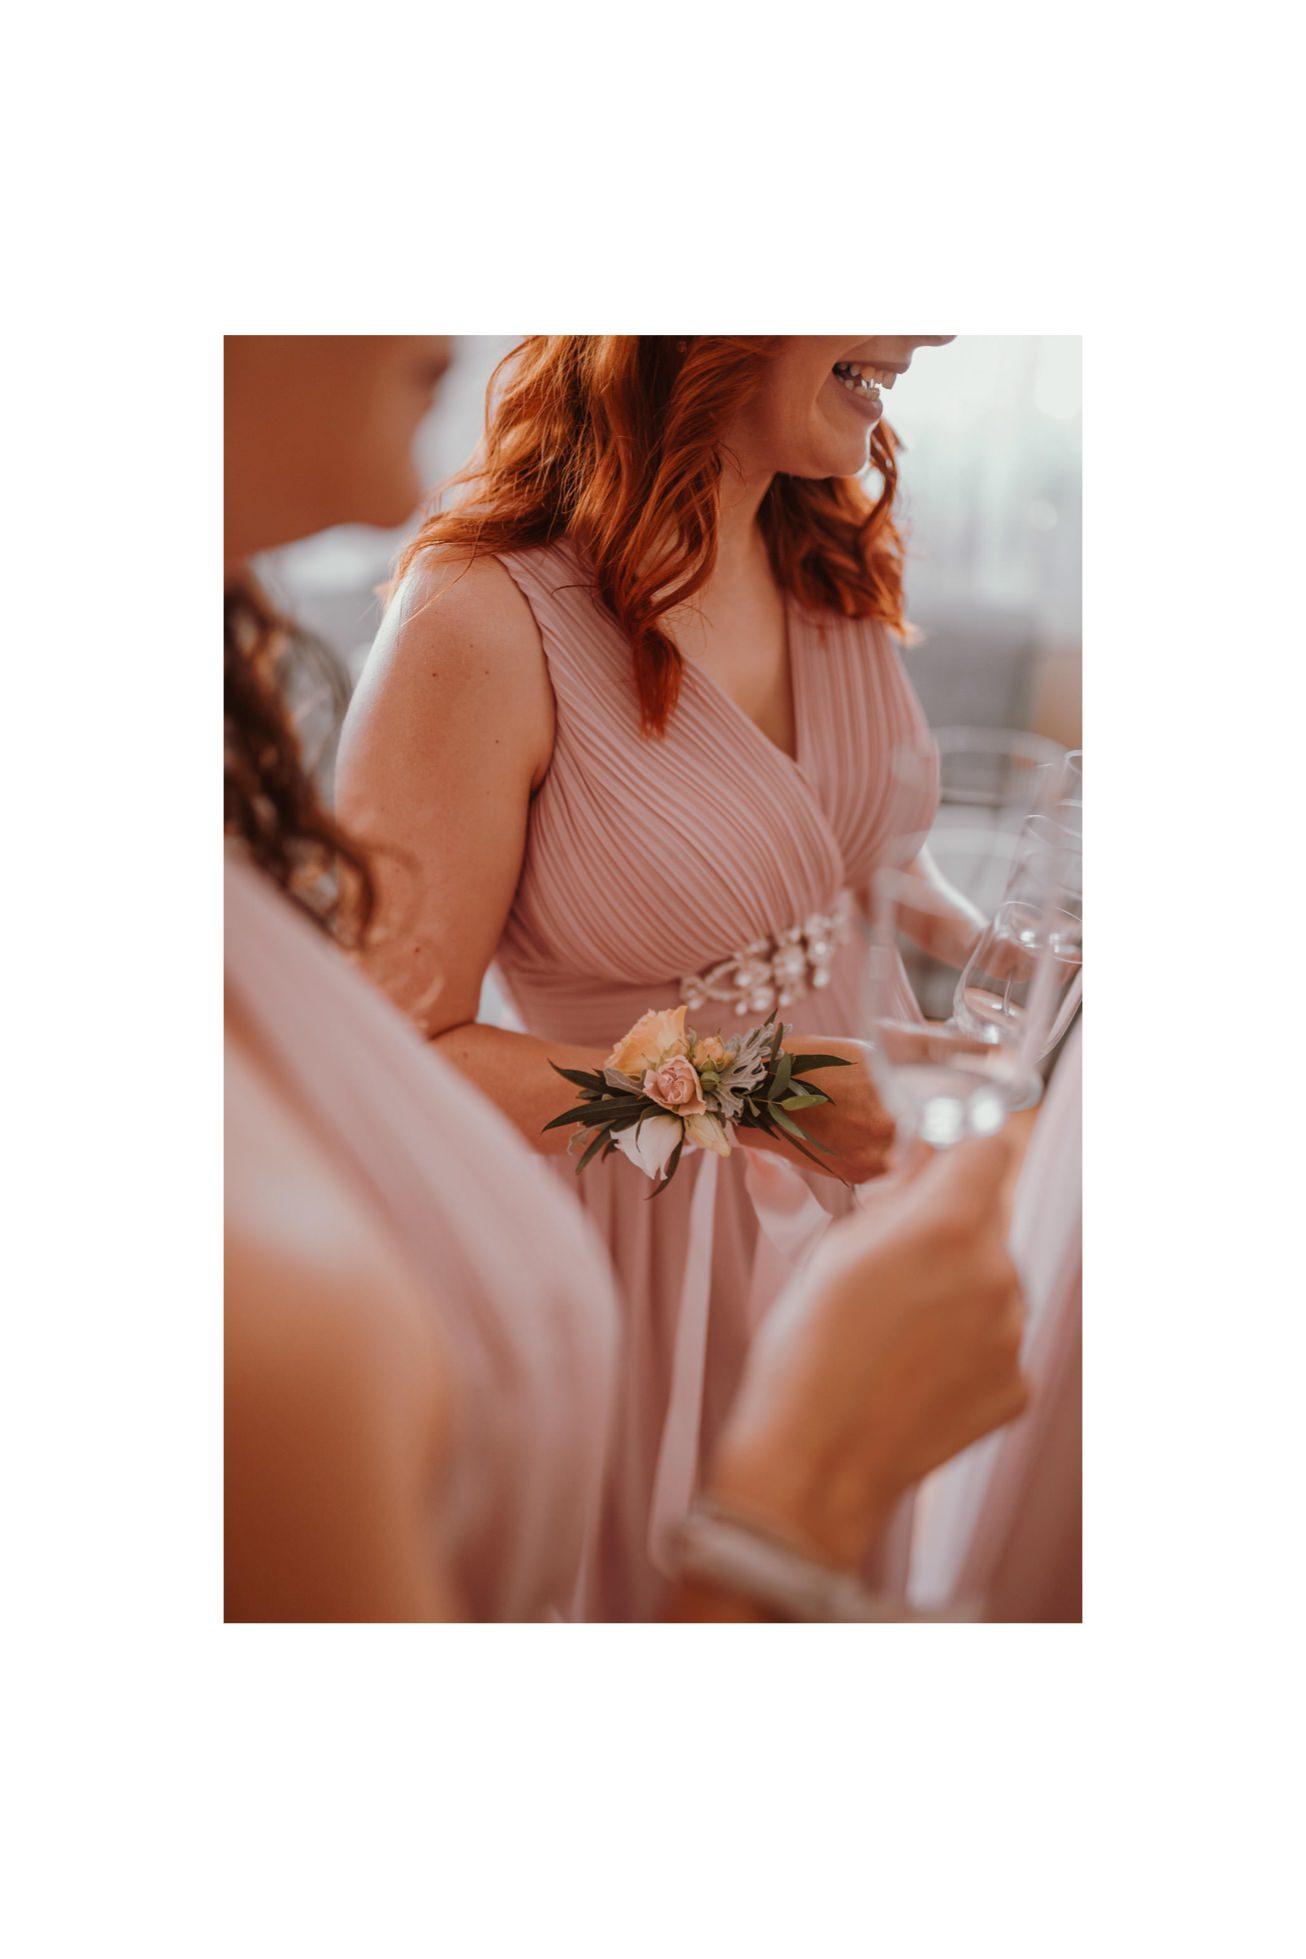 Poroka Zagarjev Mlin Novo mesto Porocni fotograf Wedding photographer 29